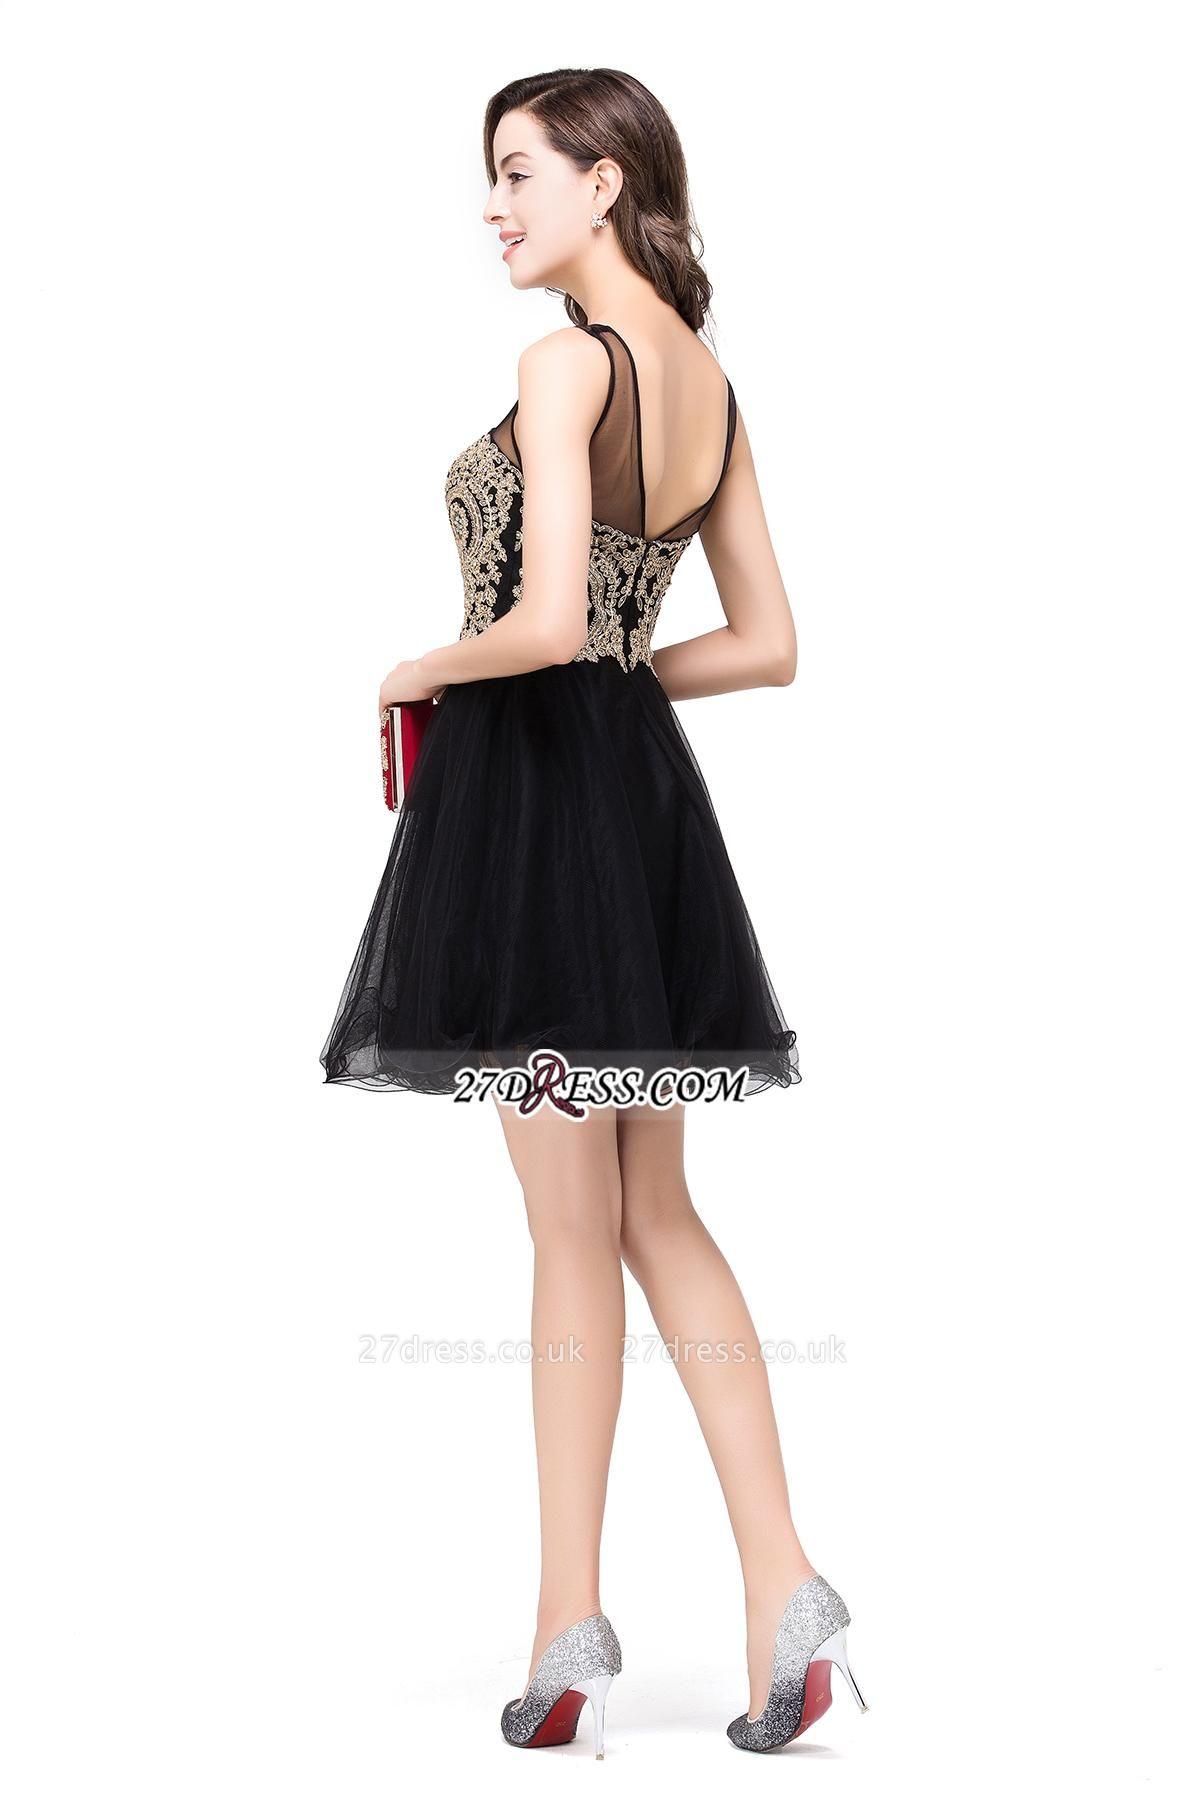 Sleeveless Appliques Elegant Black Tulle Homecoming Dress UK